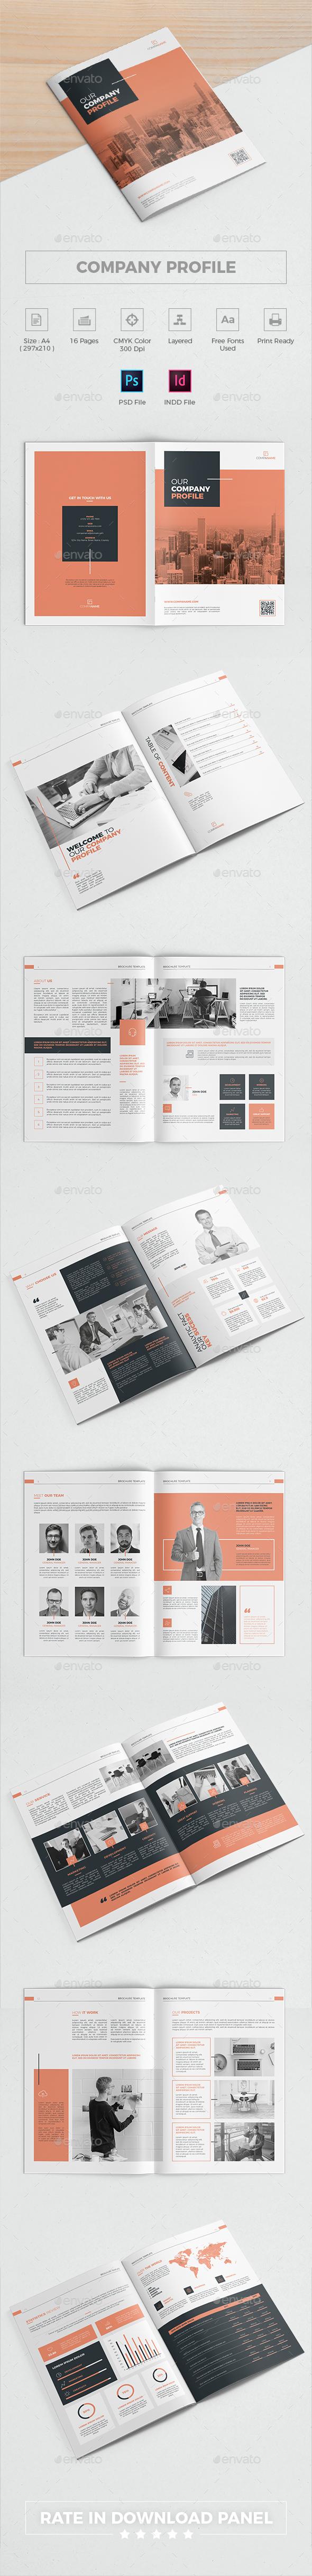 Company Profile Brochure - Brochures Print Templates